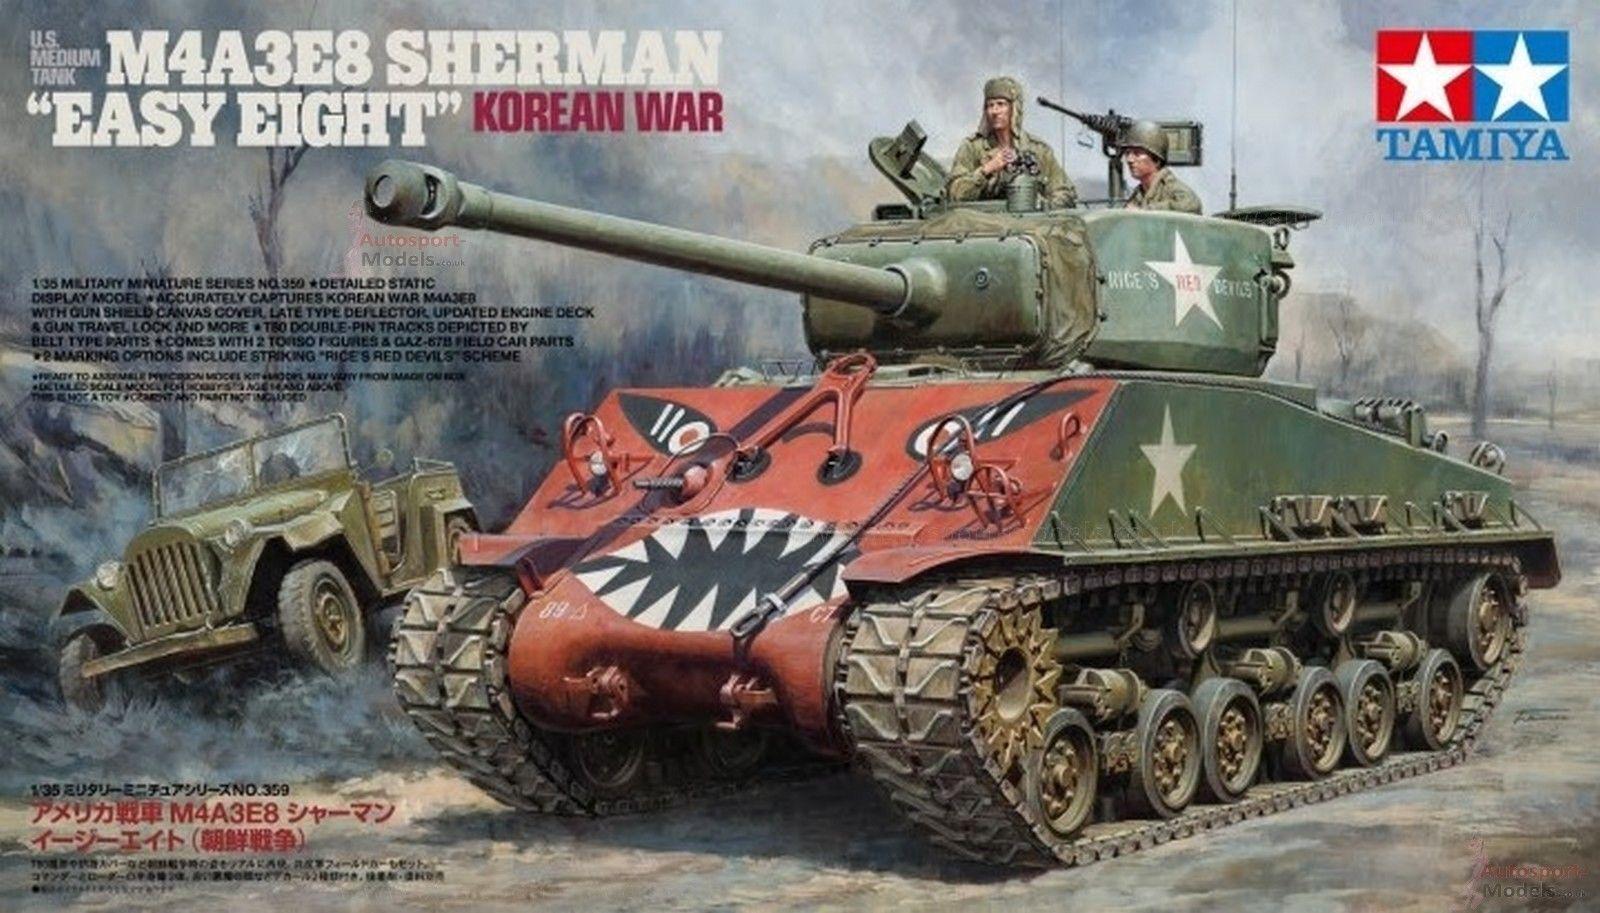 precios al por mayor TAMIYA 1 35 KIT KIT KIT CocheRO ARMATO  U.S. M4A3E8 SHERMAN 'EASY EIGHT' KOREAN WAR 35359  tomar hasta un 70% de descuento